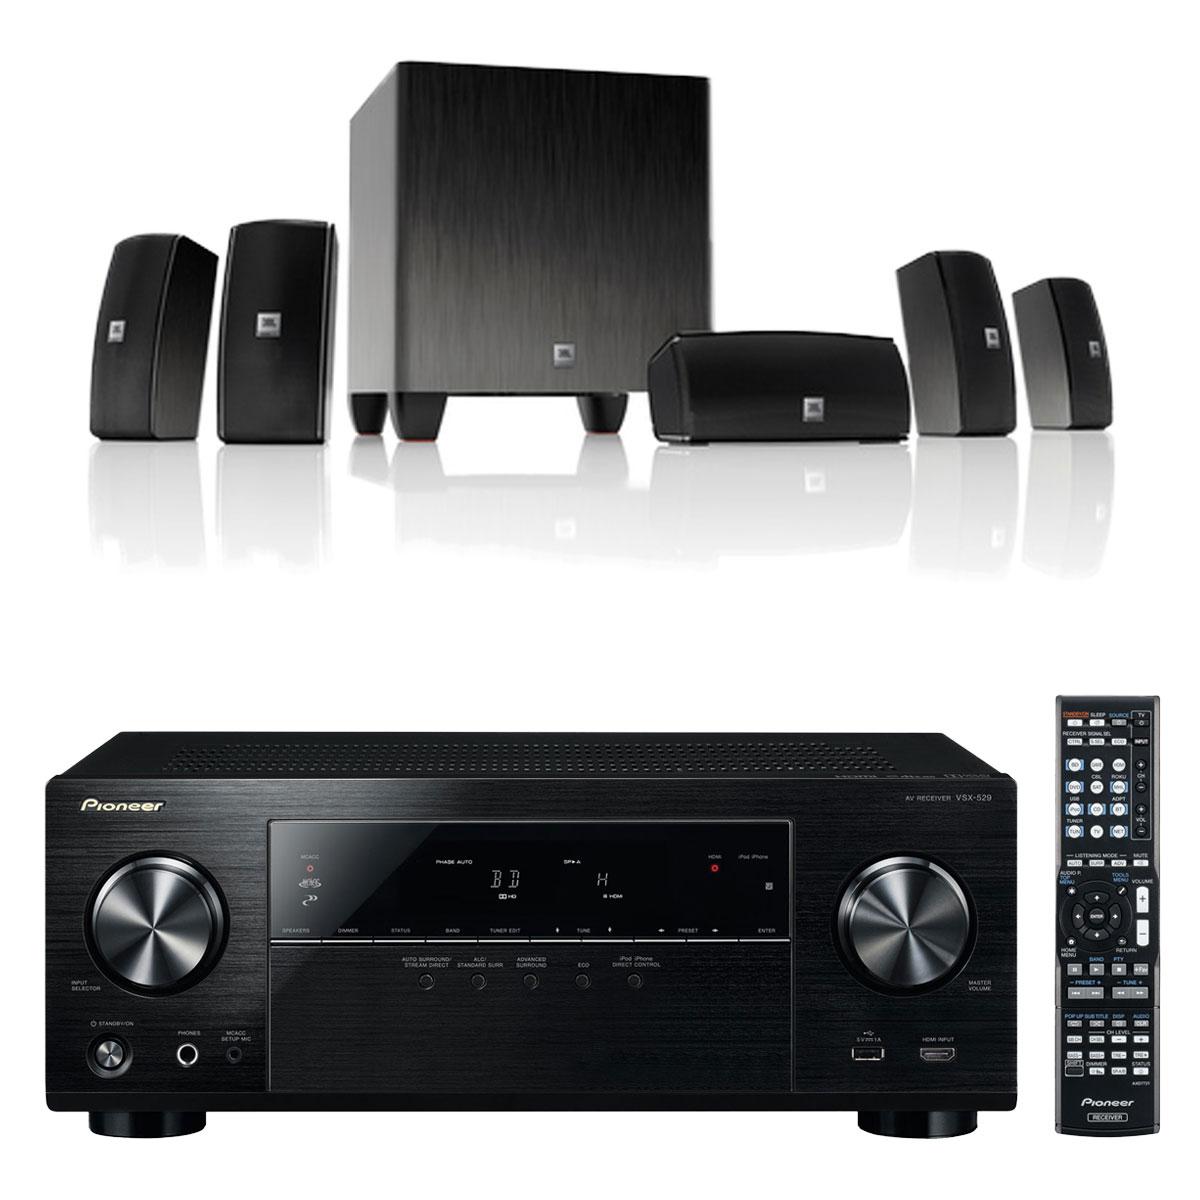 pioneer vsx 529 k jbl cinema 610 ensemble home cin ma pioneer sur. Black Bedroom Furniture Sets. Home Design Ideas